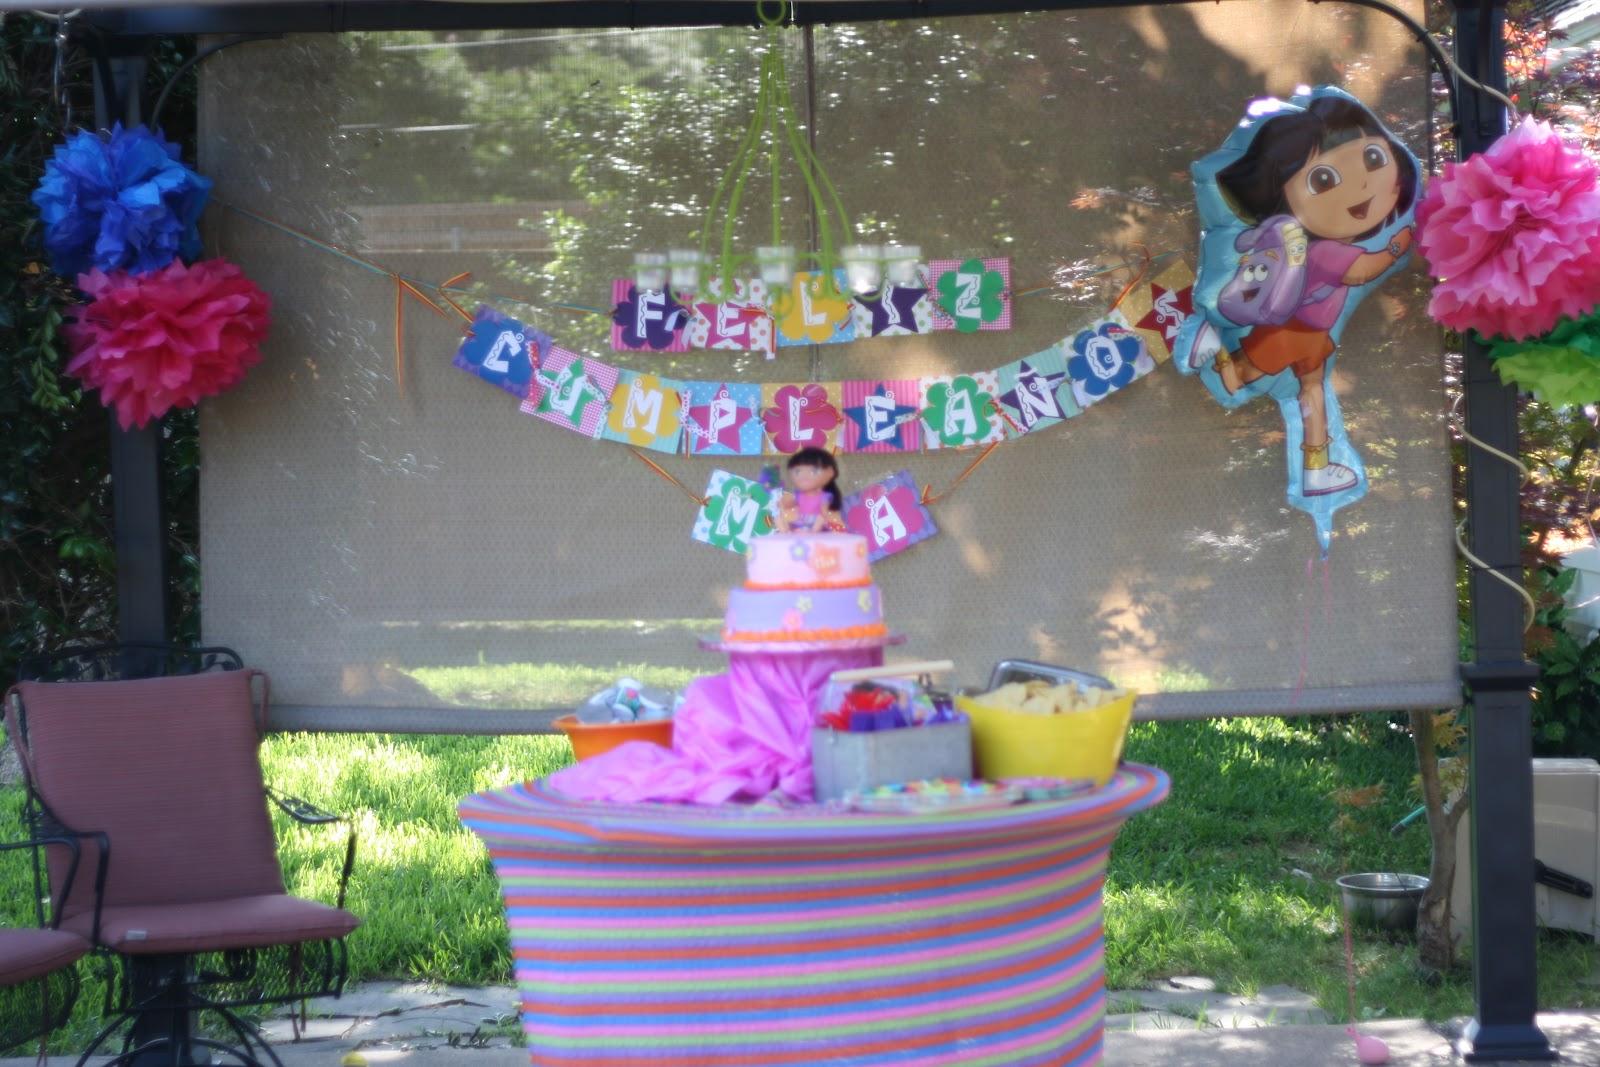 Hope Longing Life Mia S Dora Fiesta